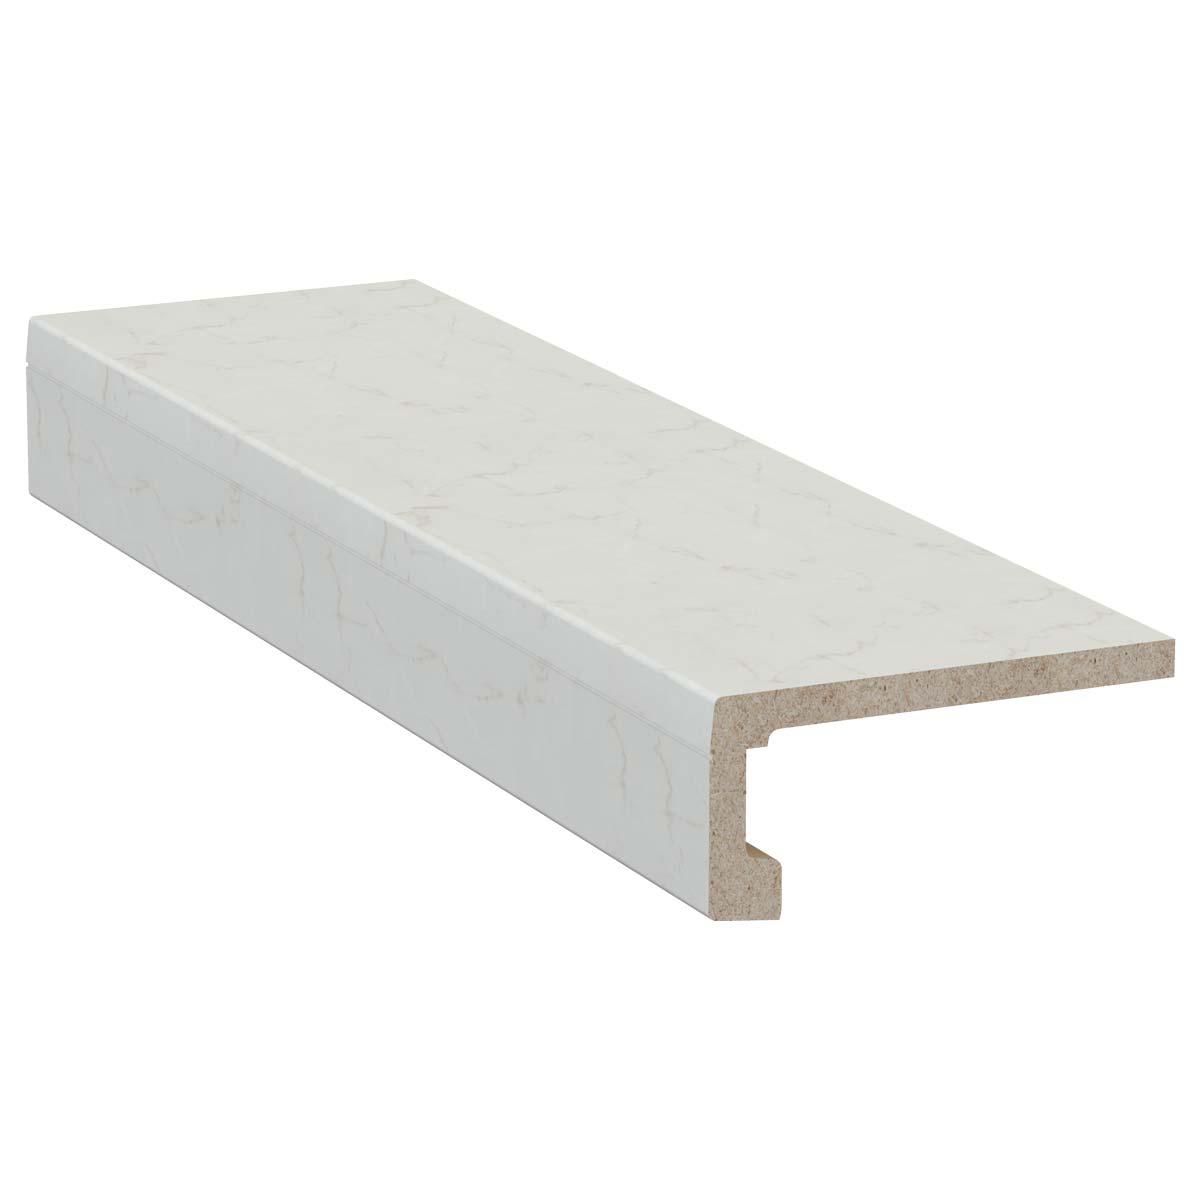 exclusiv system 100 070 - https://www.werzalit.com/es/producto/exclusiv-system-la-repisa-para-interior-longitud-6-000-mm-anchura-400-mm-altura-de-apertura-140-mm-decoracion-070-marmor-bianco/